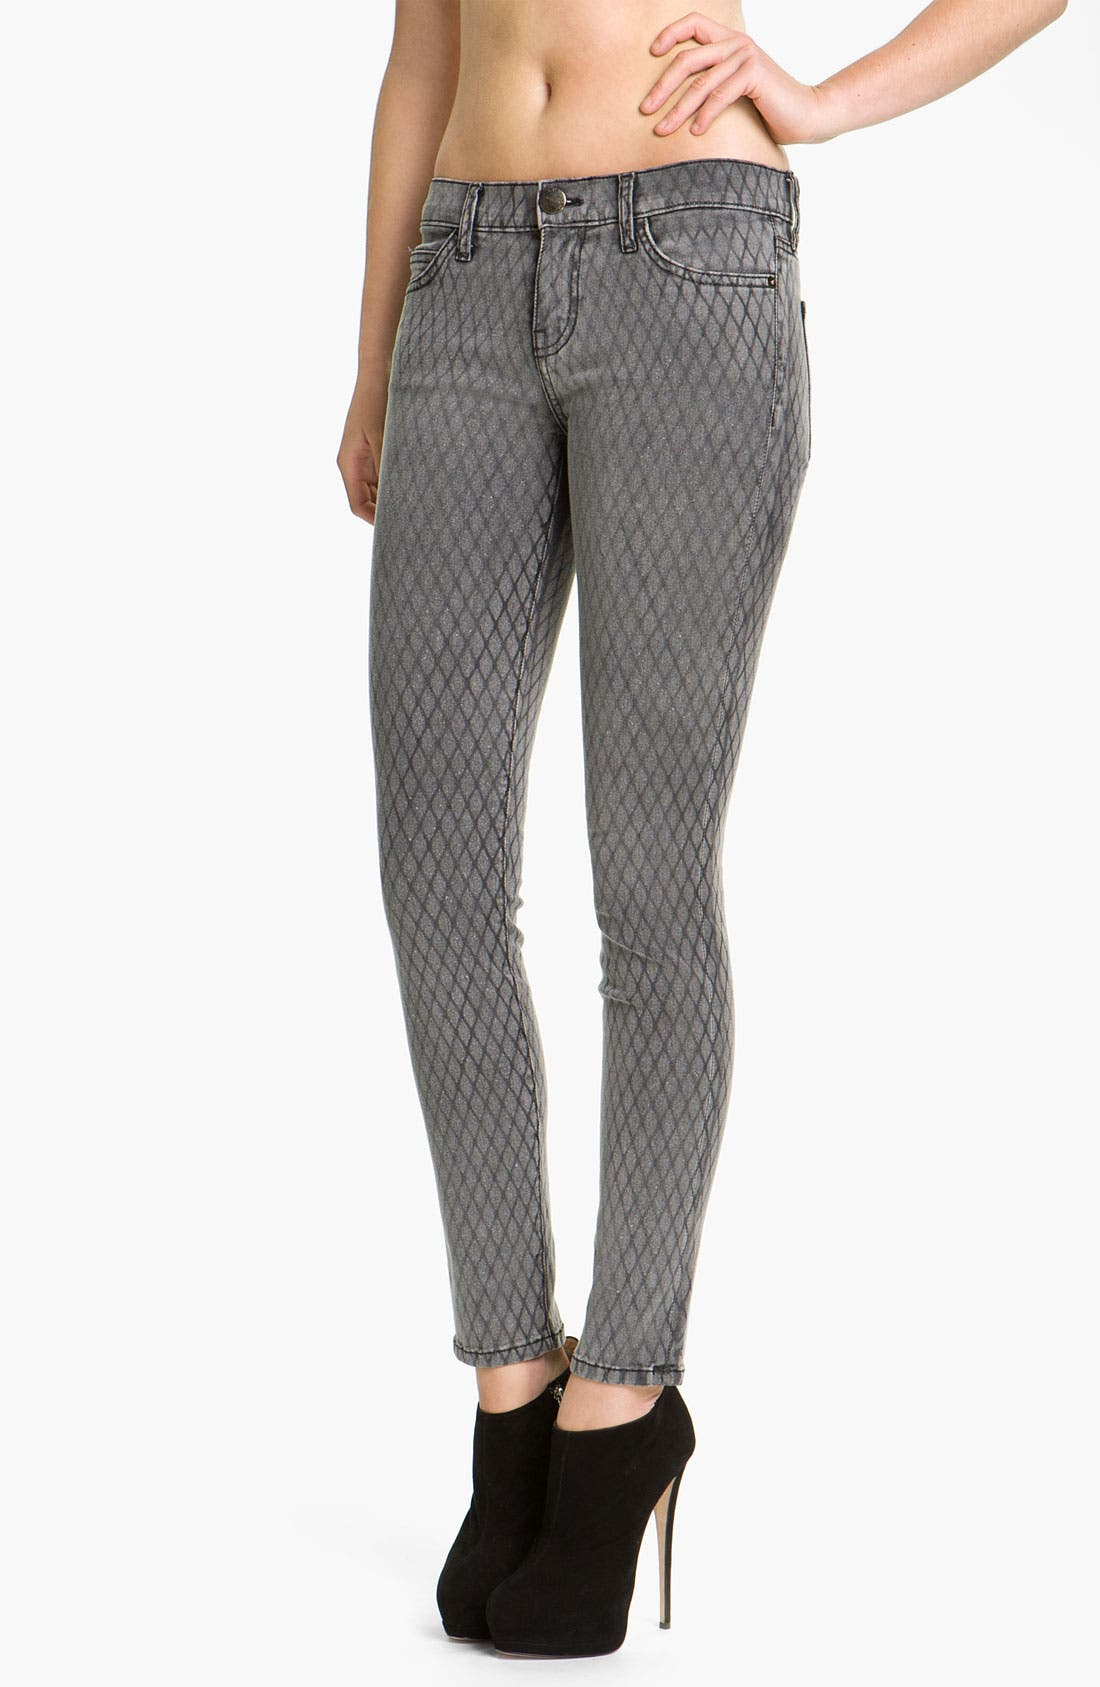 Alternate Image 1 Selected - Current/Elliott Print Stretch Skinny Jeans (Fishnet)